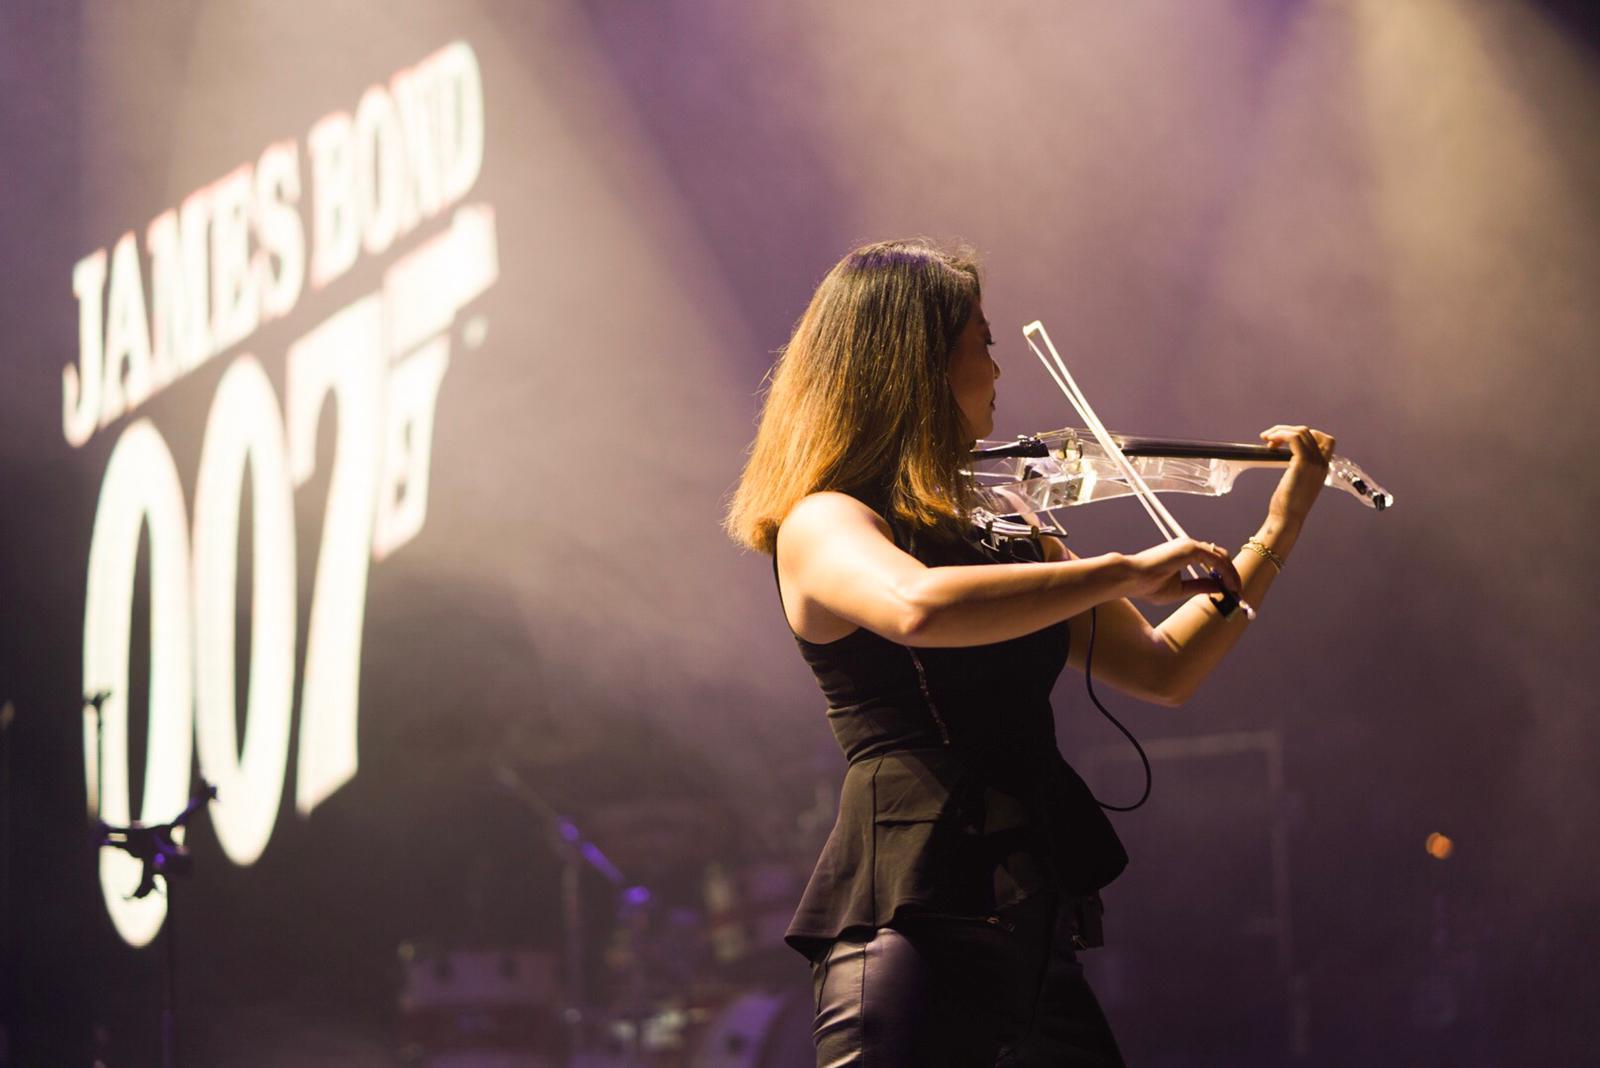 Bond act met violiste Miss Sun